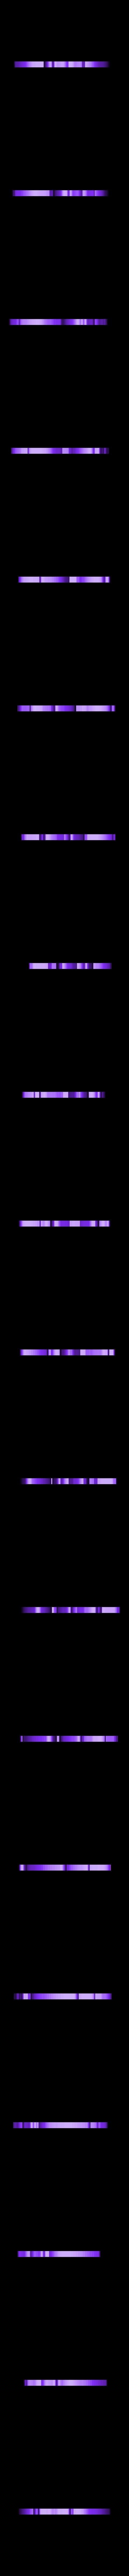 renardvide.stl Télécharger fichier STL Emporte pièce renard • Design pour impression 3D, n256